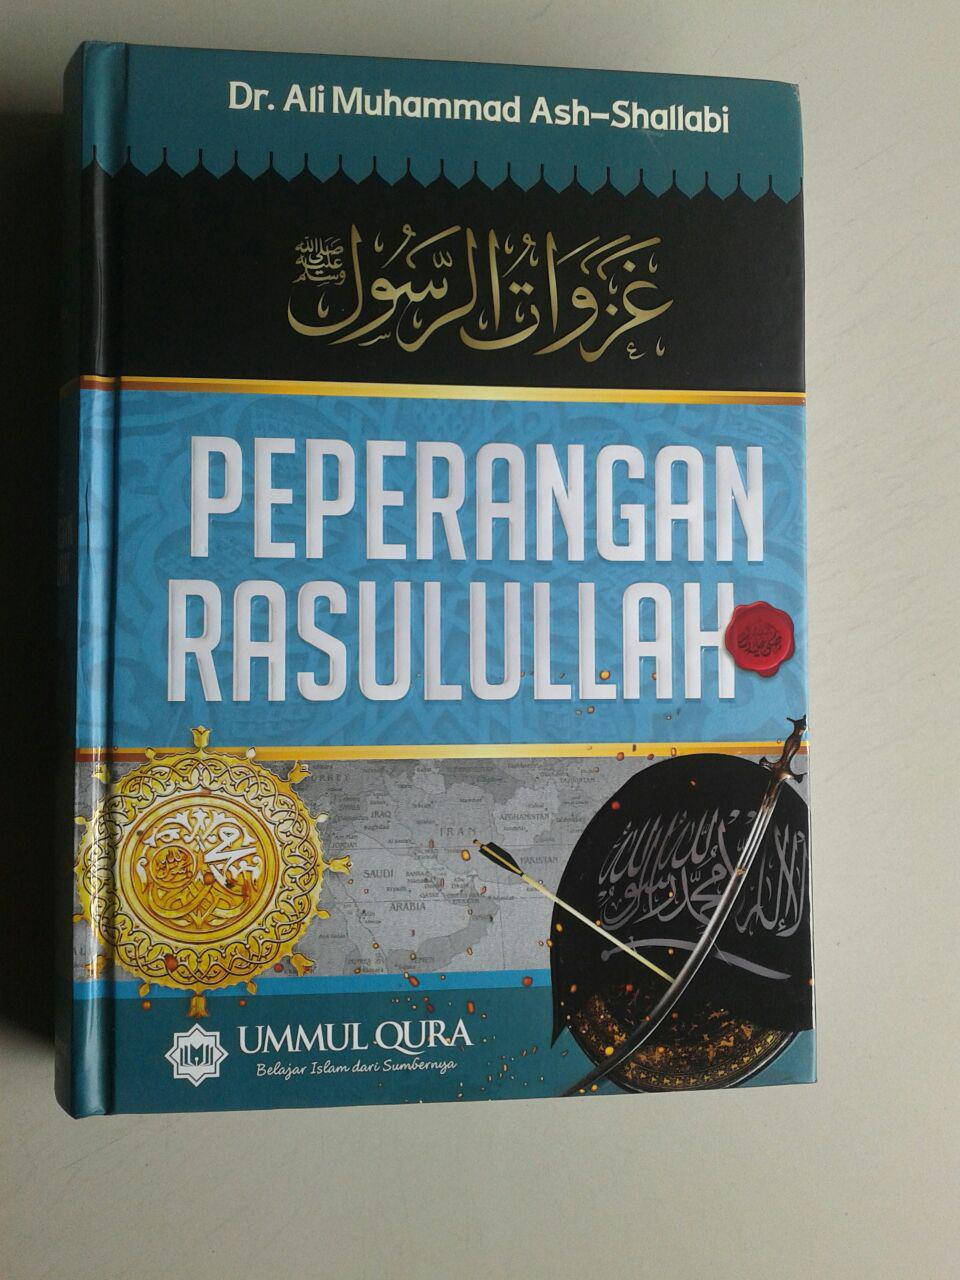 Buku Peperangan Rasulullah Shallallahu Alaihi wa Sallam cover 2